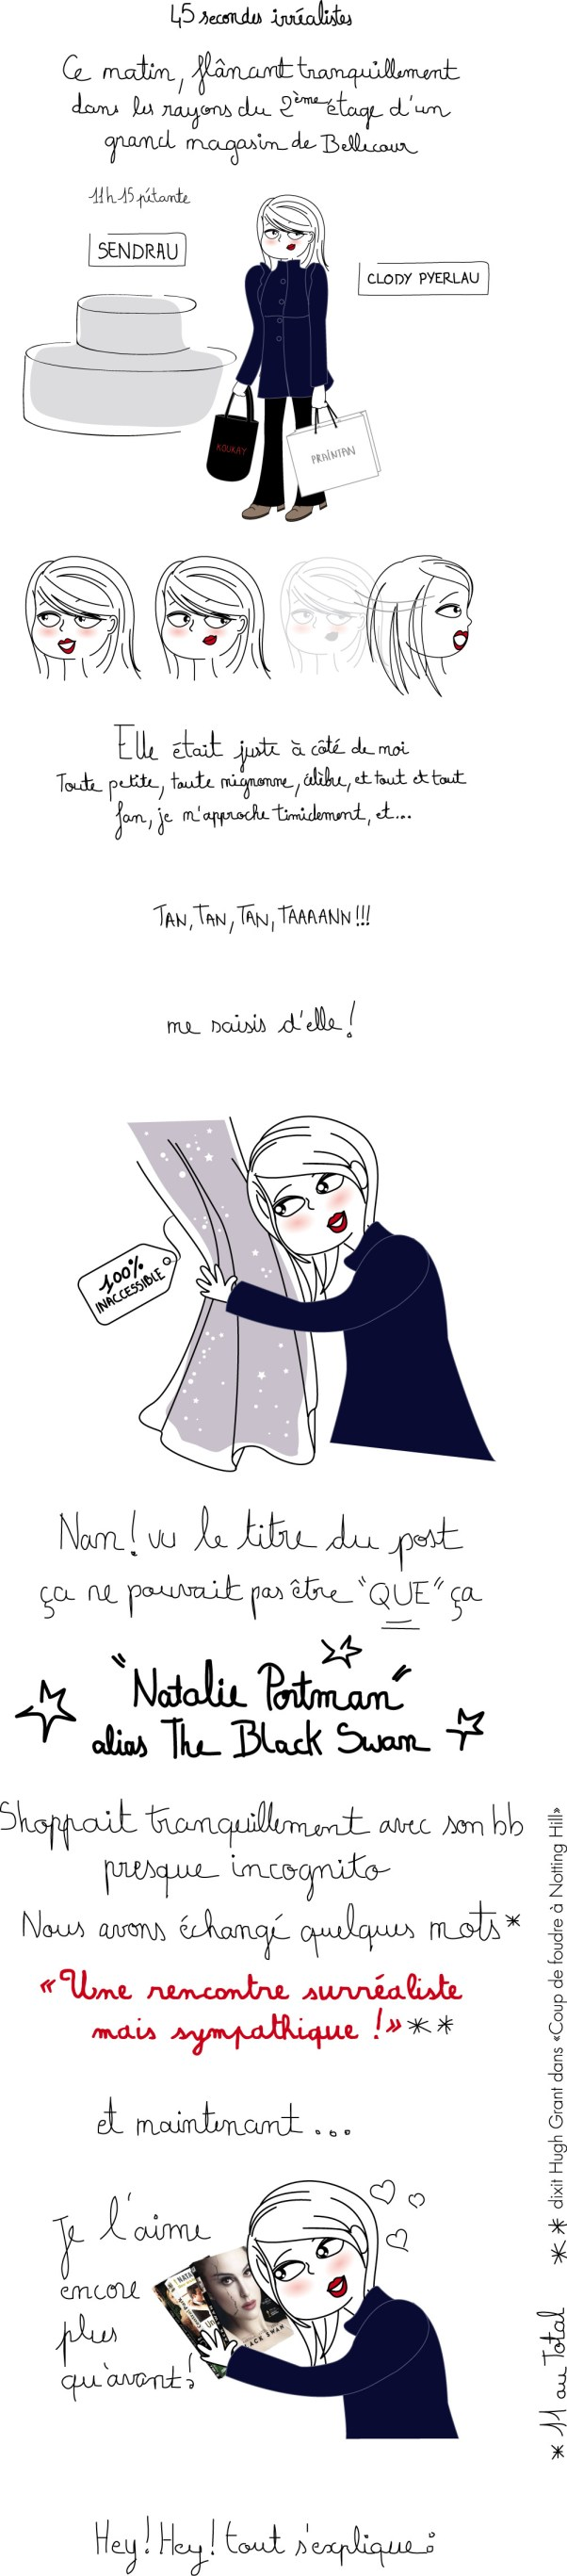 natalie_samedi